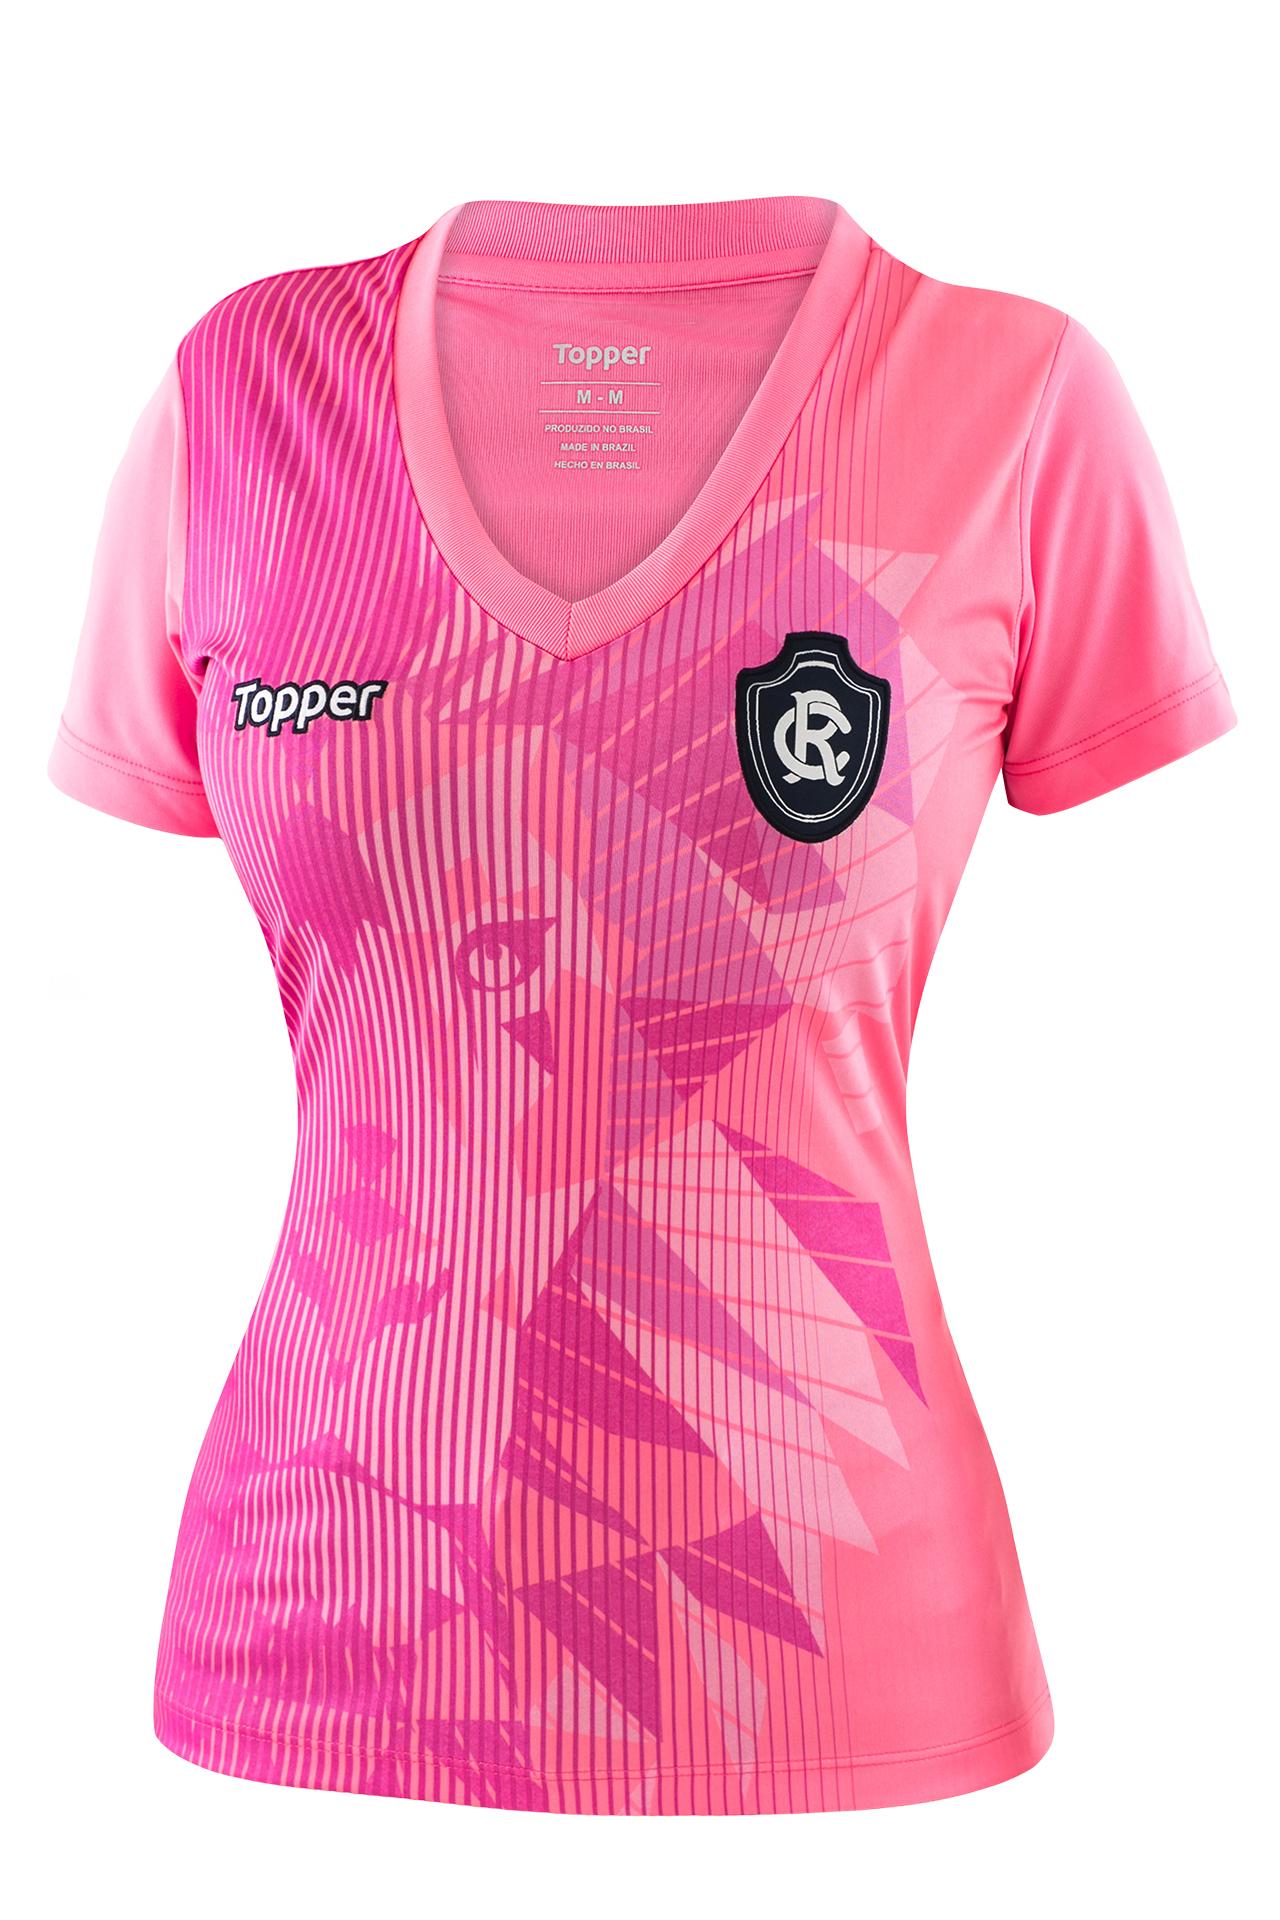 Fornecedora lança camisas alusivas ao Outubro Rosa para 11 clubes ... 85d64f5d4aa3f